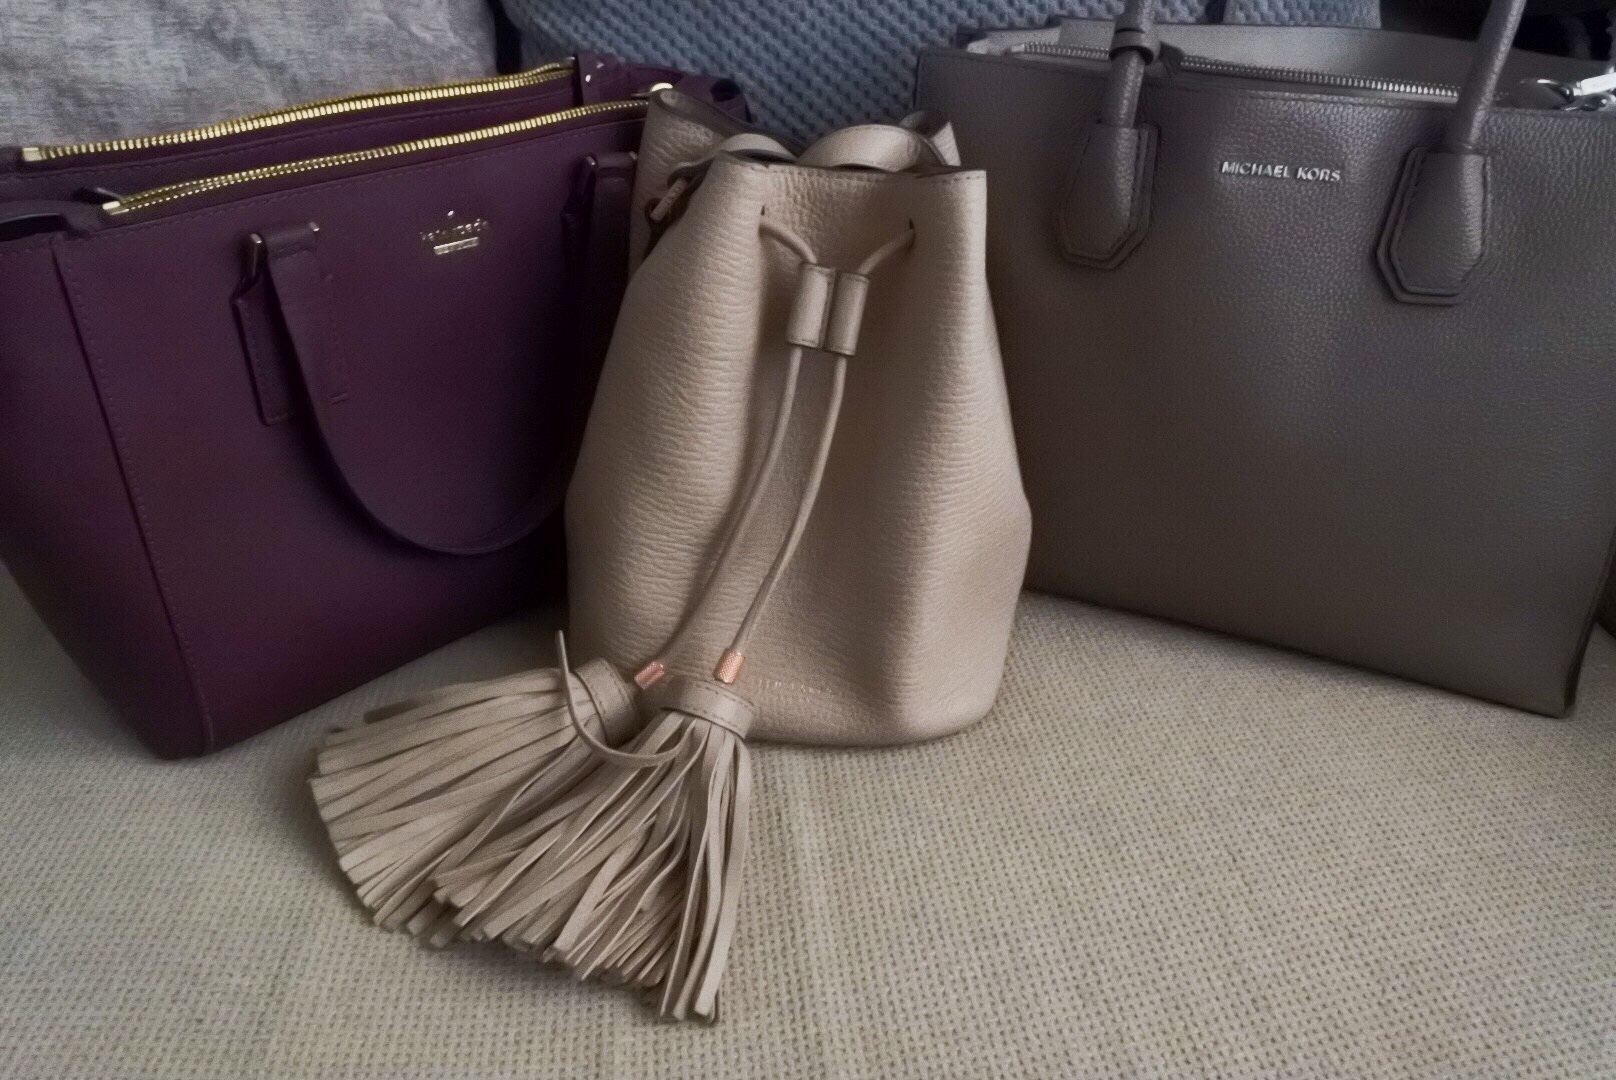 Entry level designer handbags